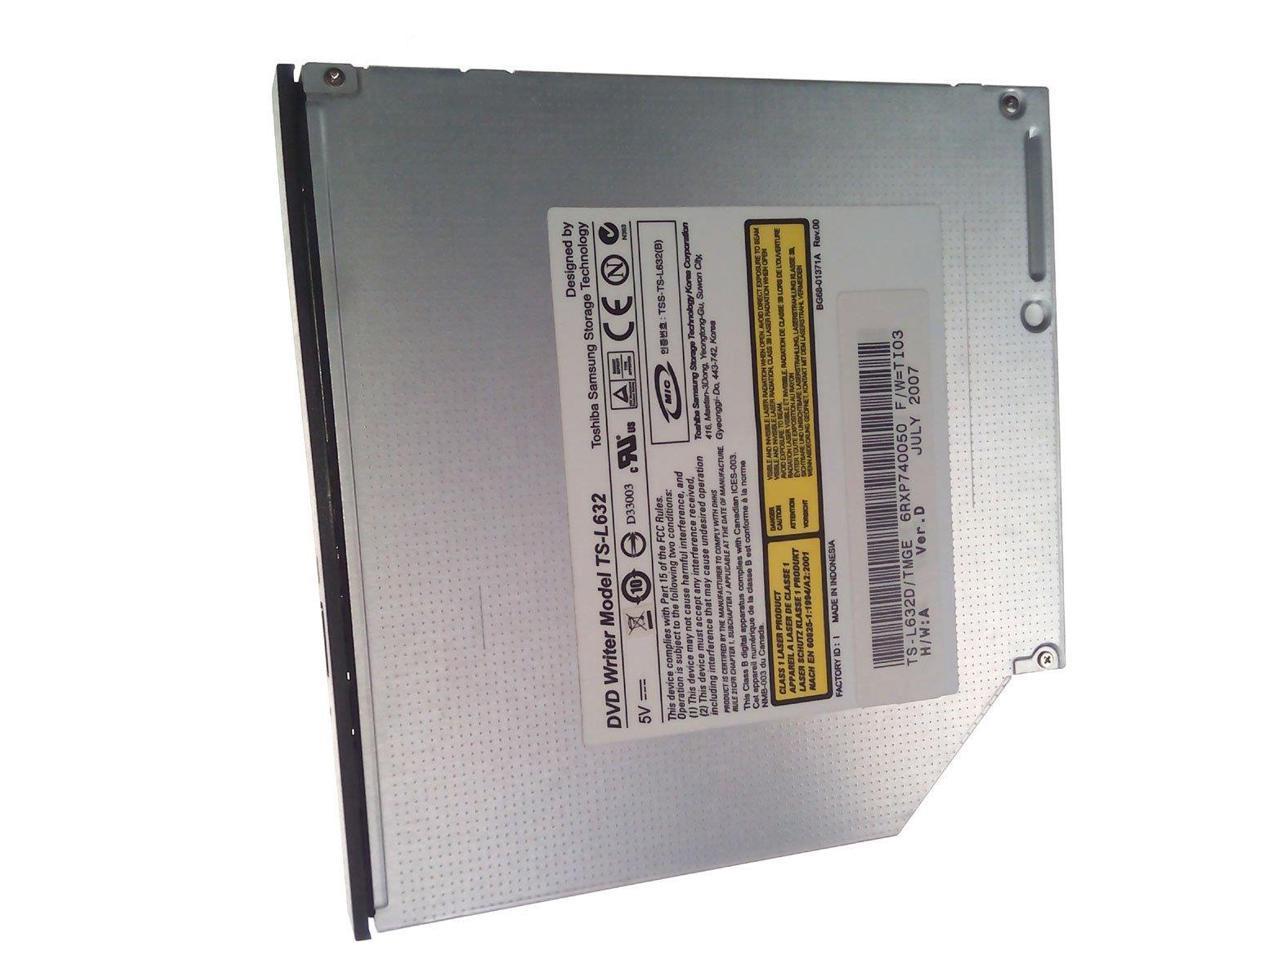 USB 2.0 External CD//DVD Drive for Compaq presario cq61-103tu